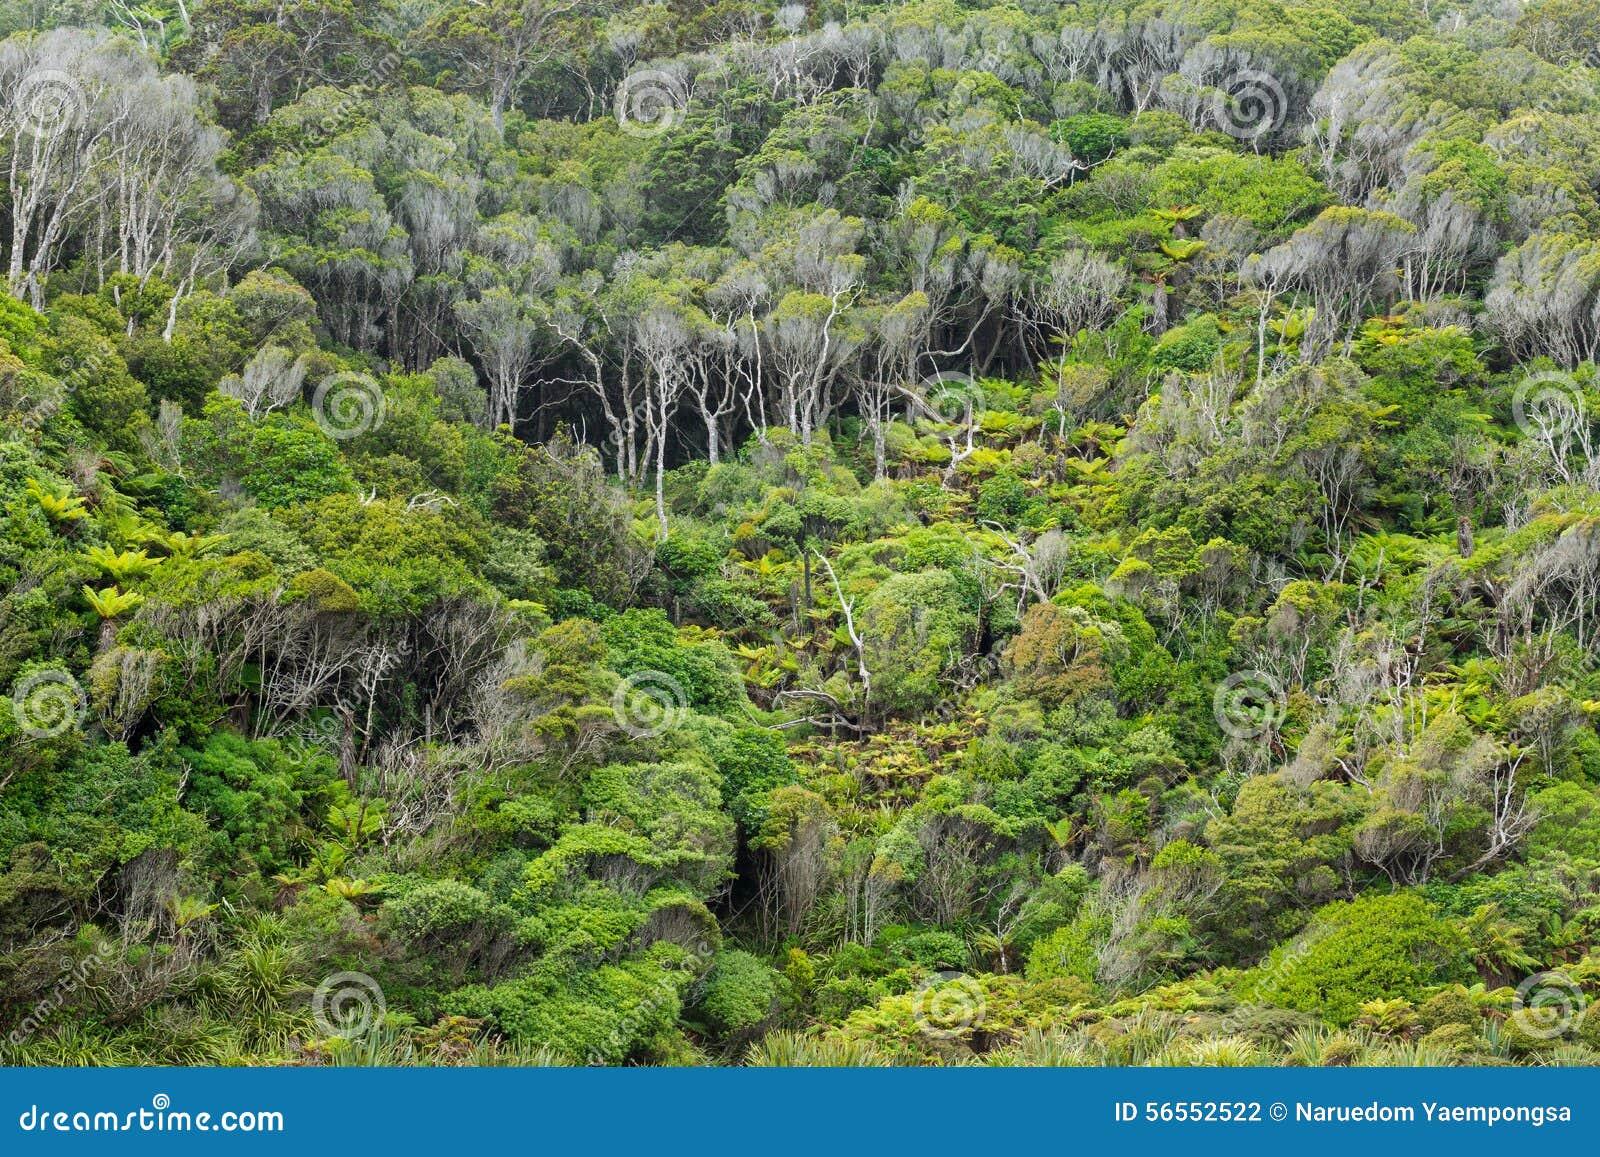 Download Εγγενής θάμνος της Νέας Ζηλανδίας Στοκ Εικόνες - εικόνα από πράσινος, φύλλωμα: 56552522